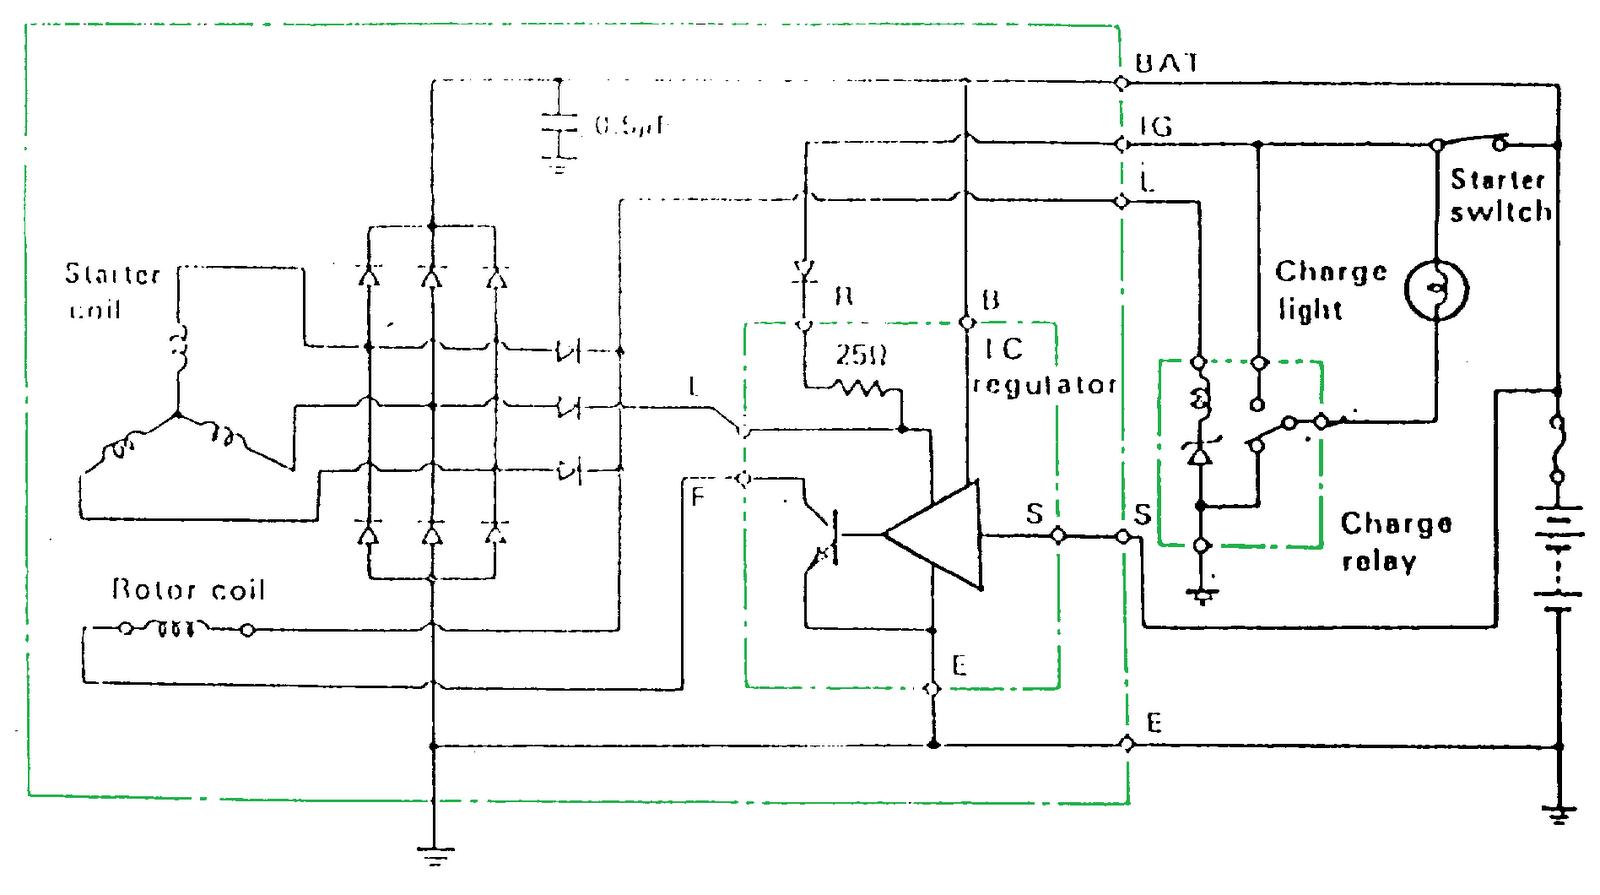 wiring diagram for electric brakes sonos speaker hayes brake controller imageresizertool com